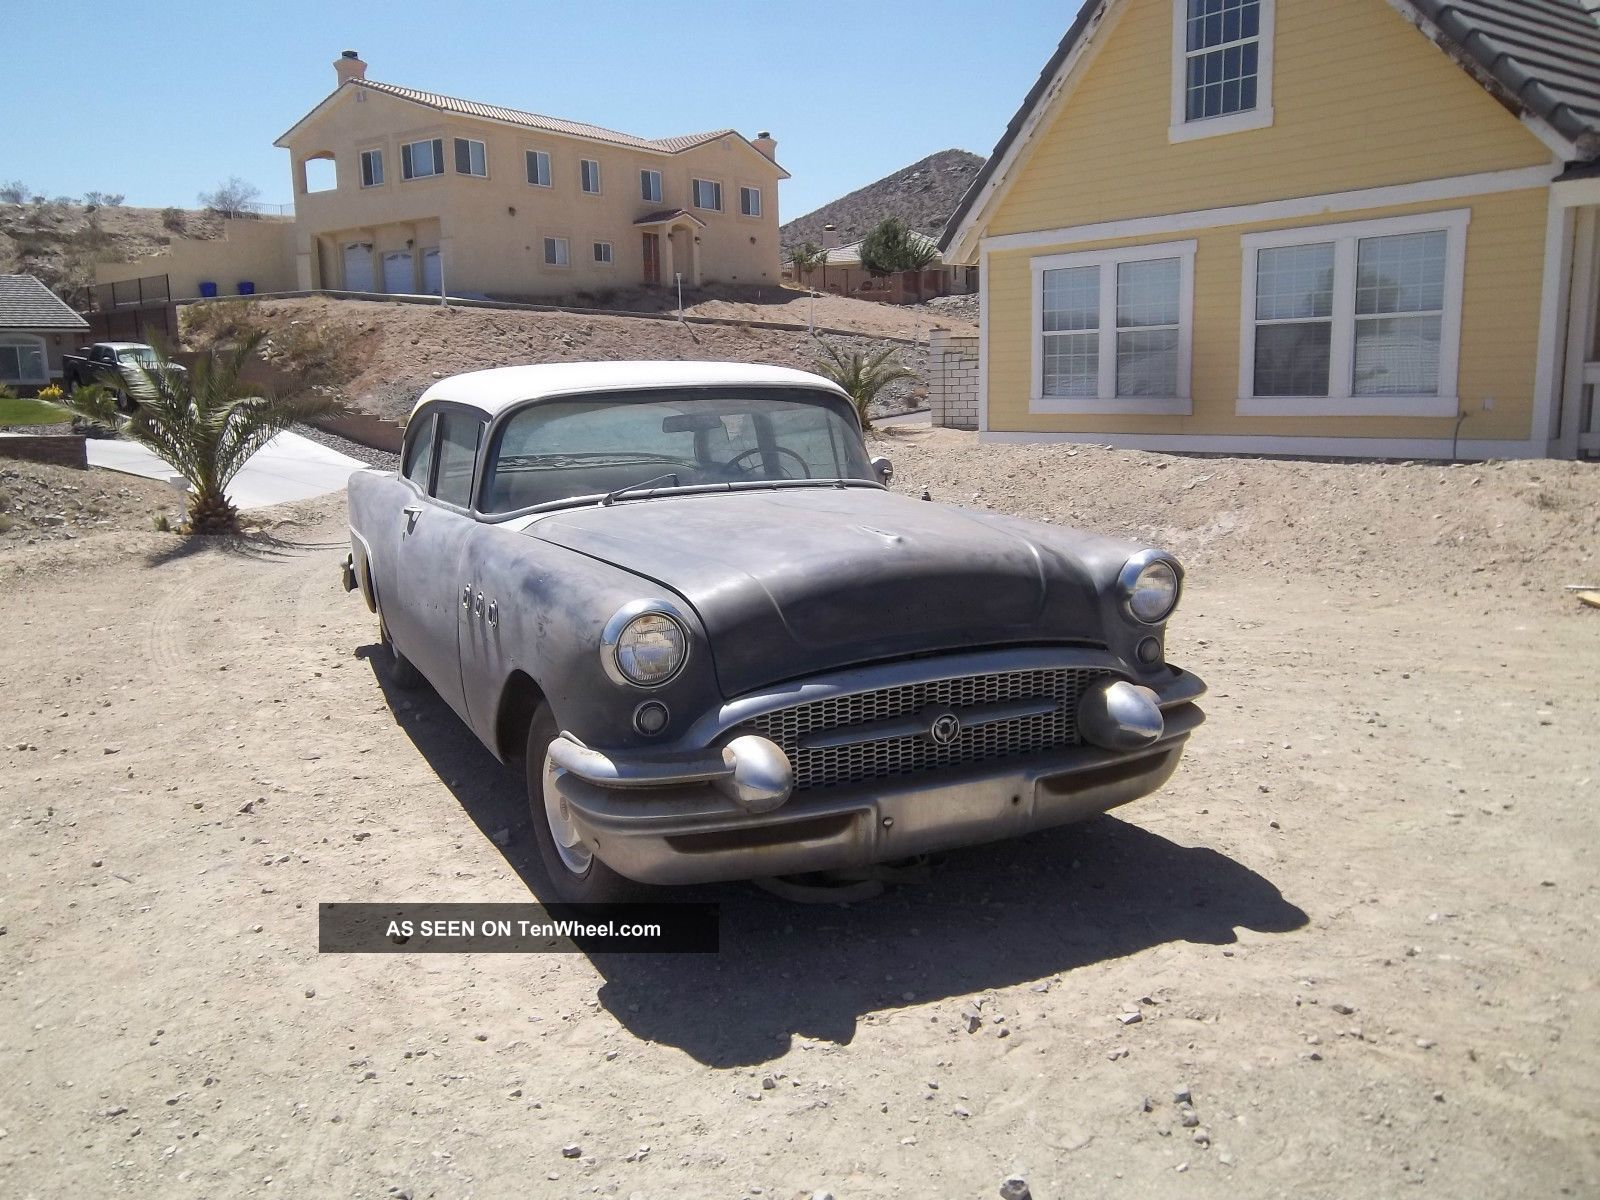 1955 Buick Special 2 Dr Nailhead V8 Kustom Century 55 Hot Rod Other photo